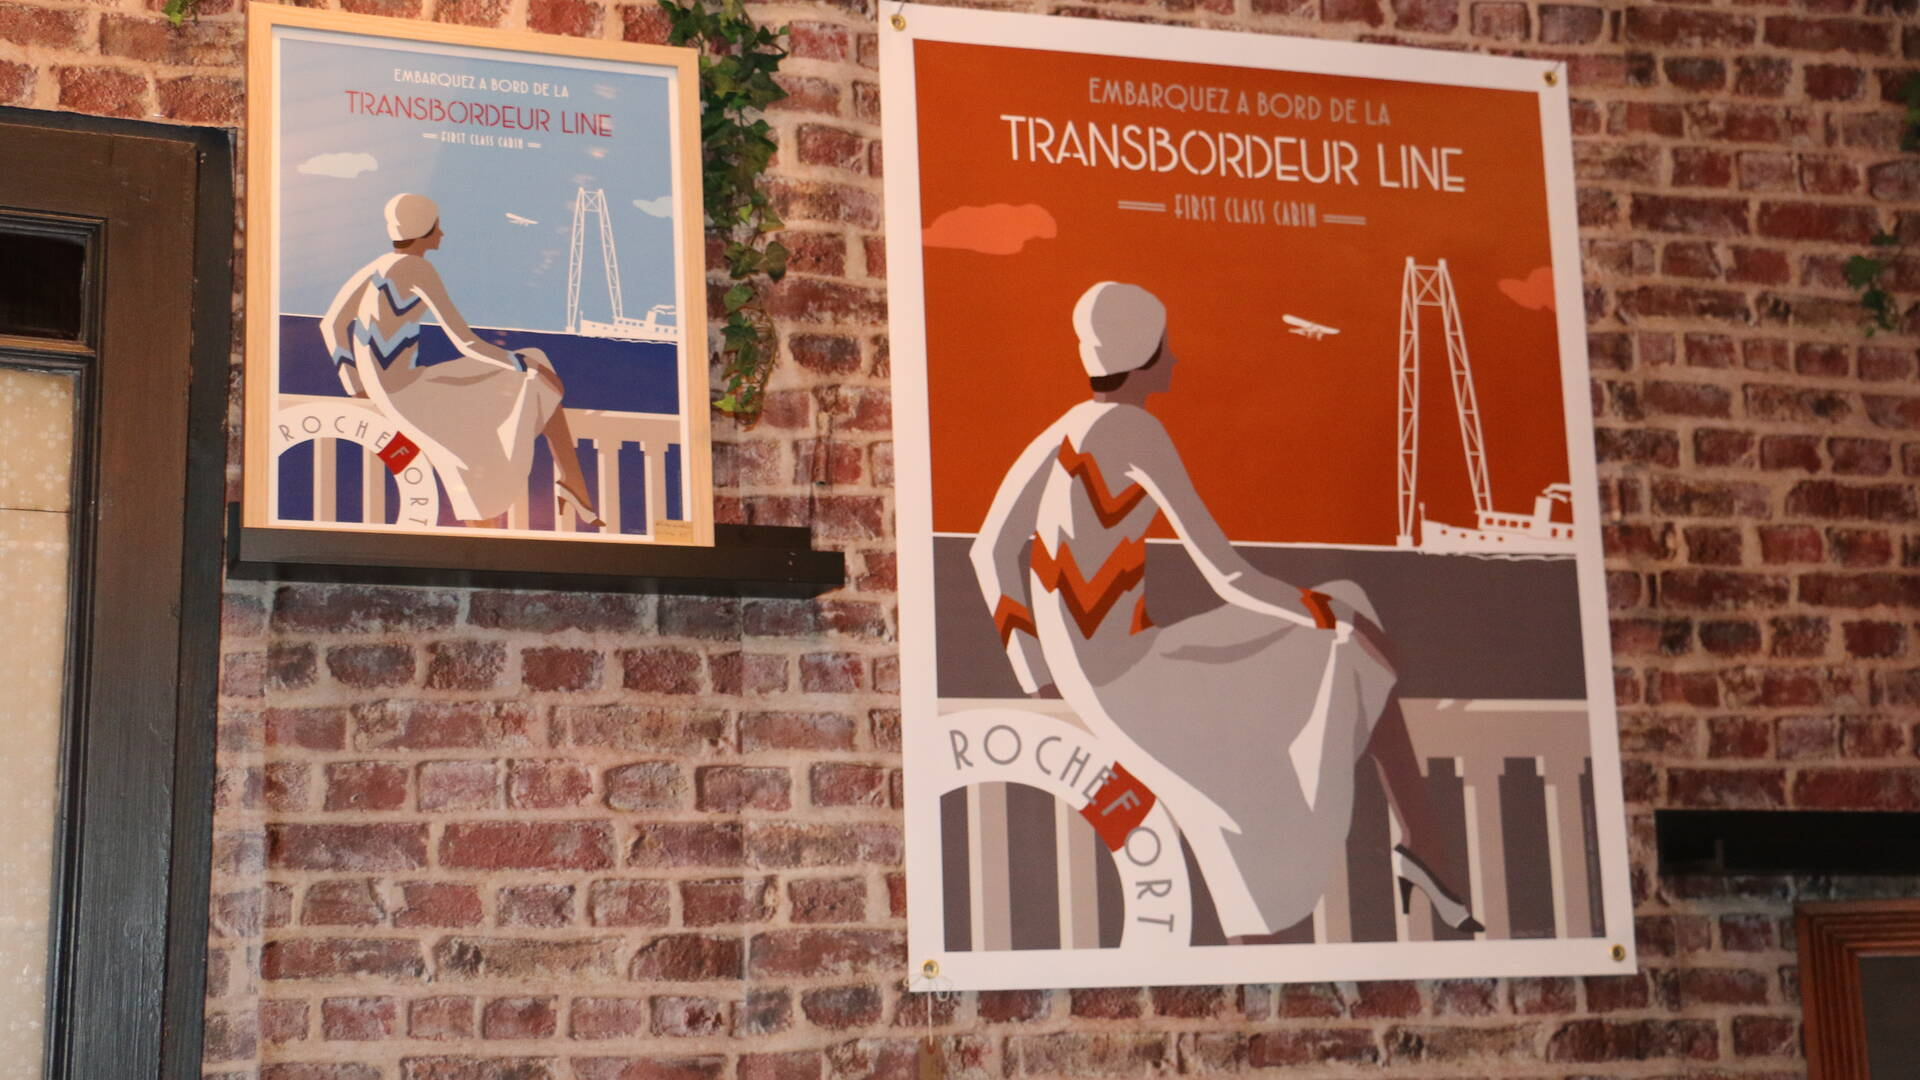 Boutique Rampe Arts,Transbordeur Line, Pont Transbordeur, Rochefort, Rochefort Océan